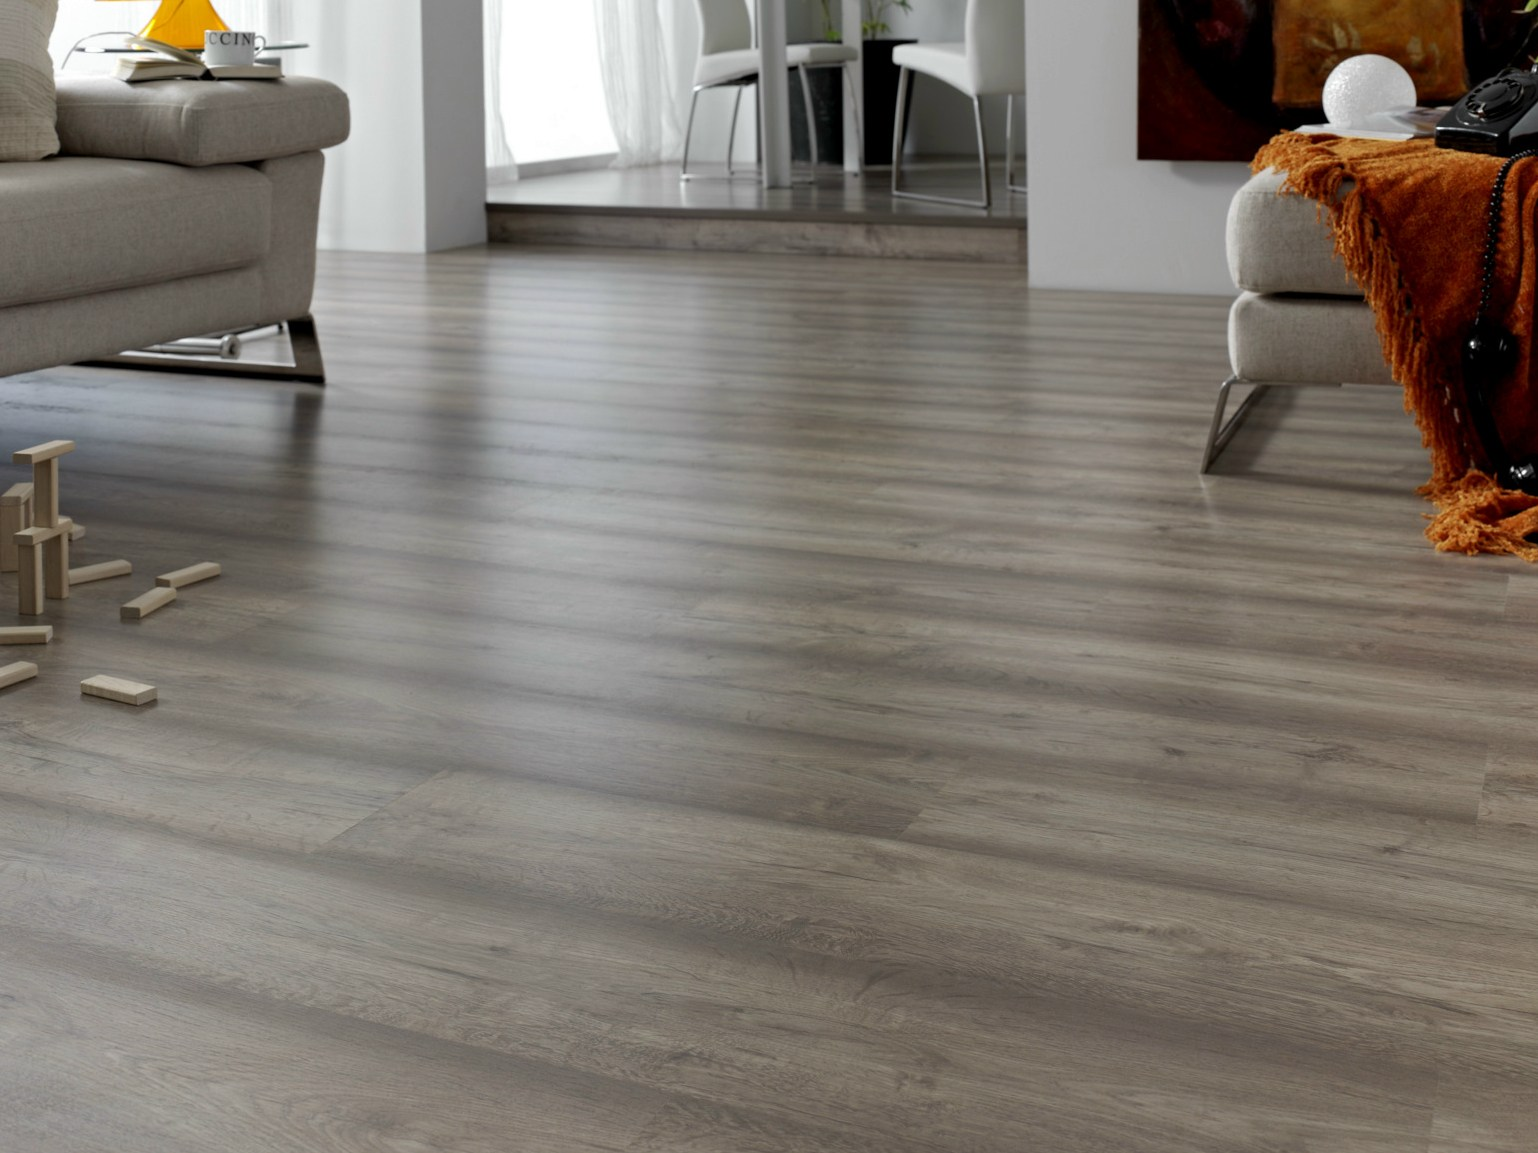 Laminate flooring finfloor quattro by legnopan - Parquet o parquet ...